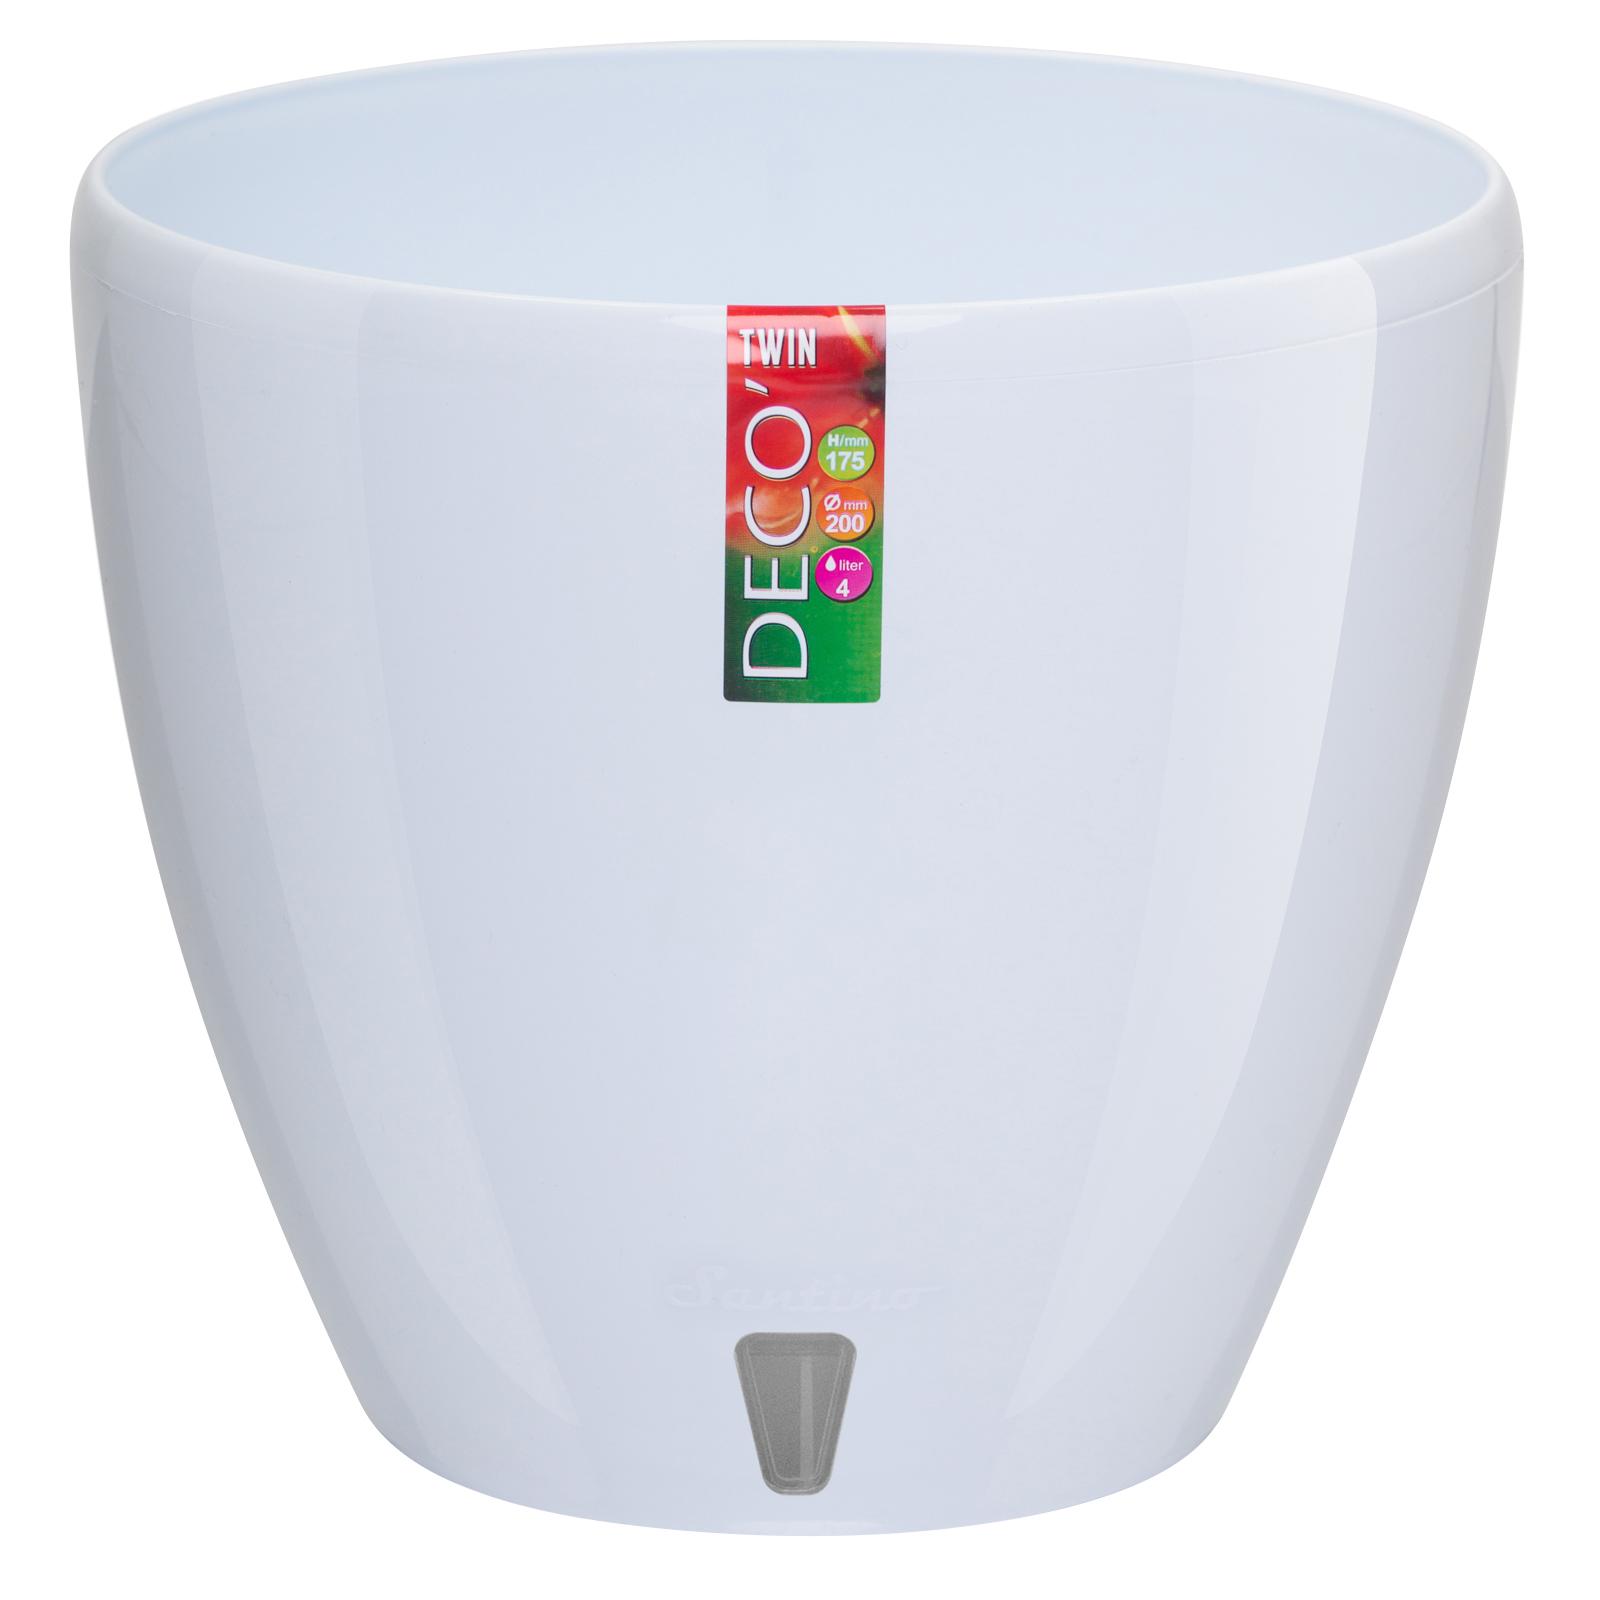 Santino Self Watering Planter DECO 8.8 Inch White Flower Pot by Santino